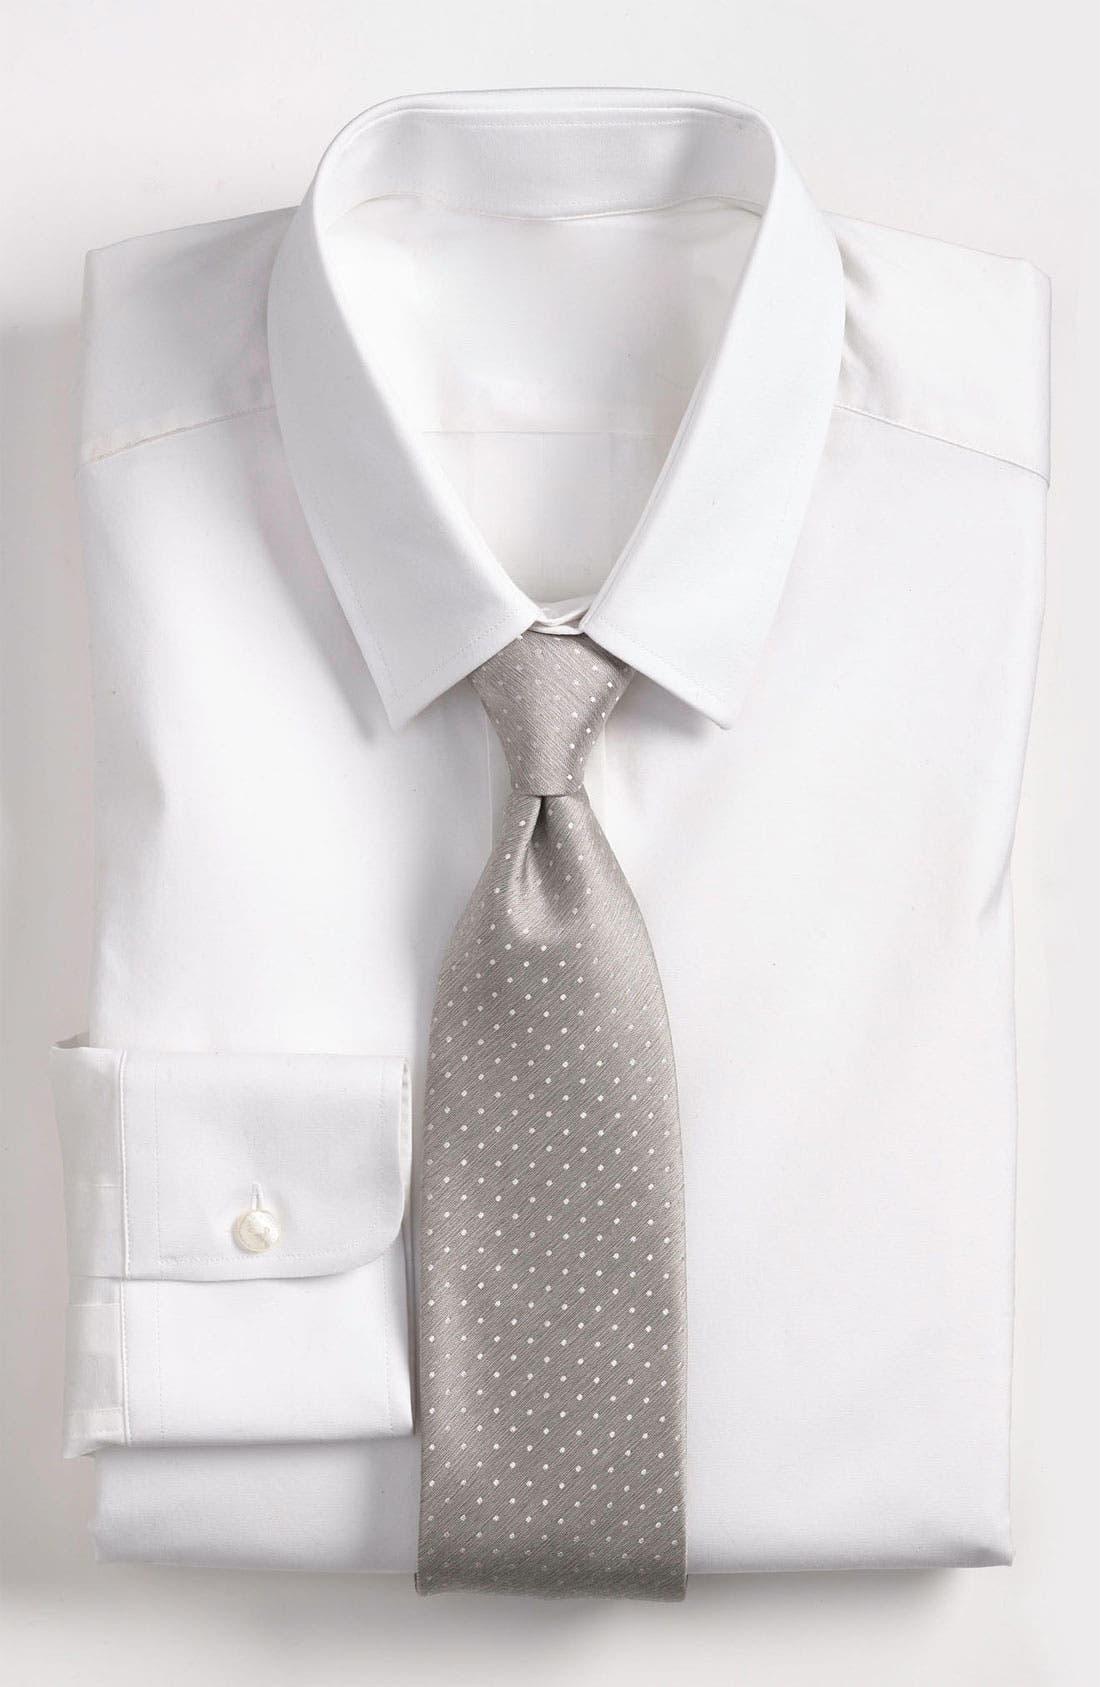 Alternate Image 1 Selected - Yves Saint Laurent Textured Dot Pattern Woven Silk Tie